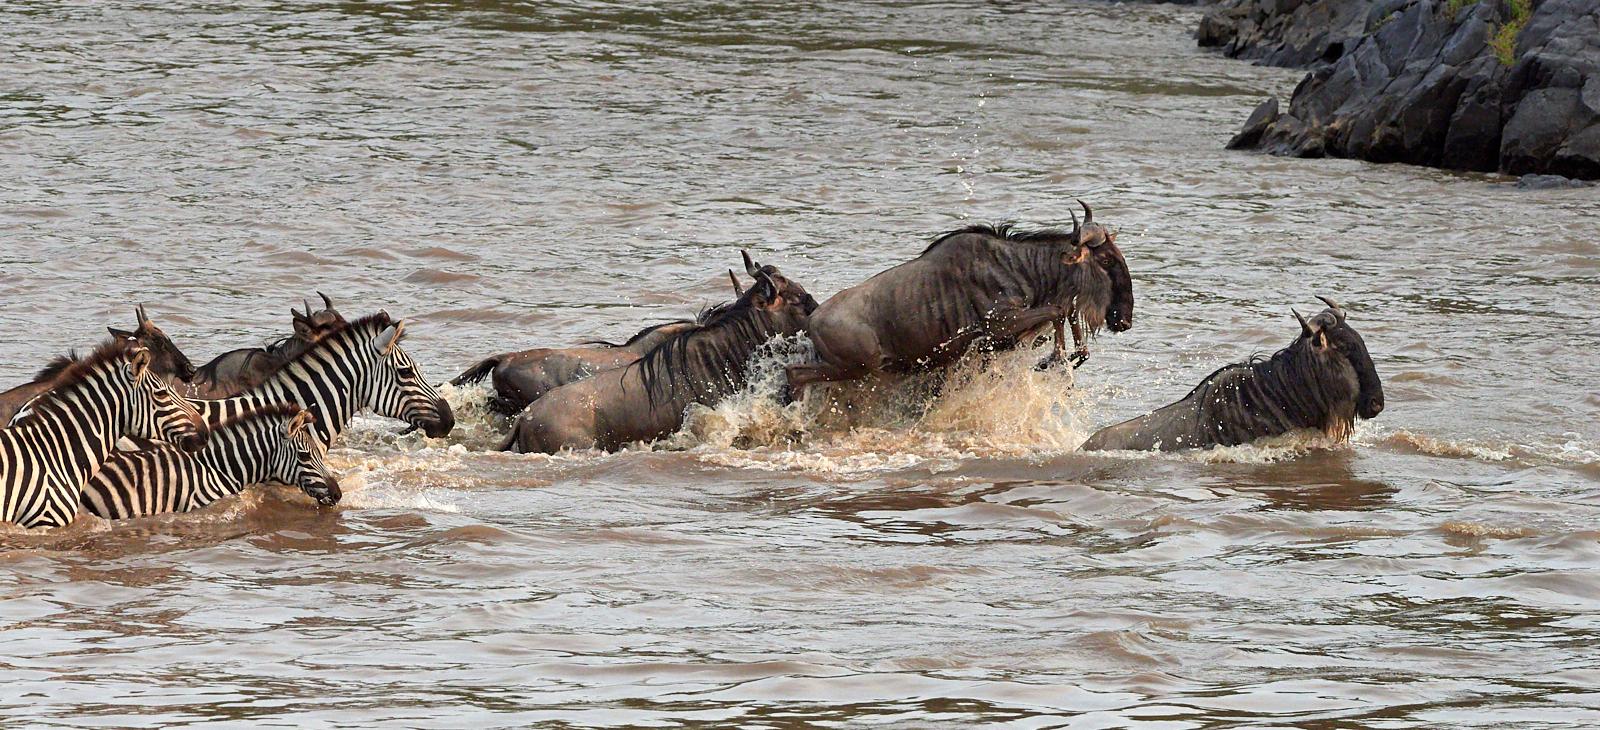 Crossing at a canter, Mara River